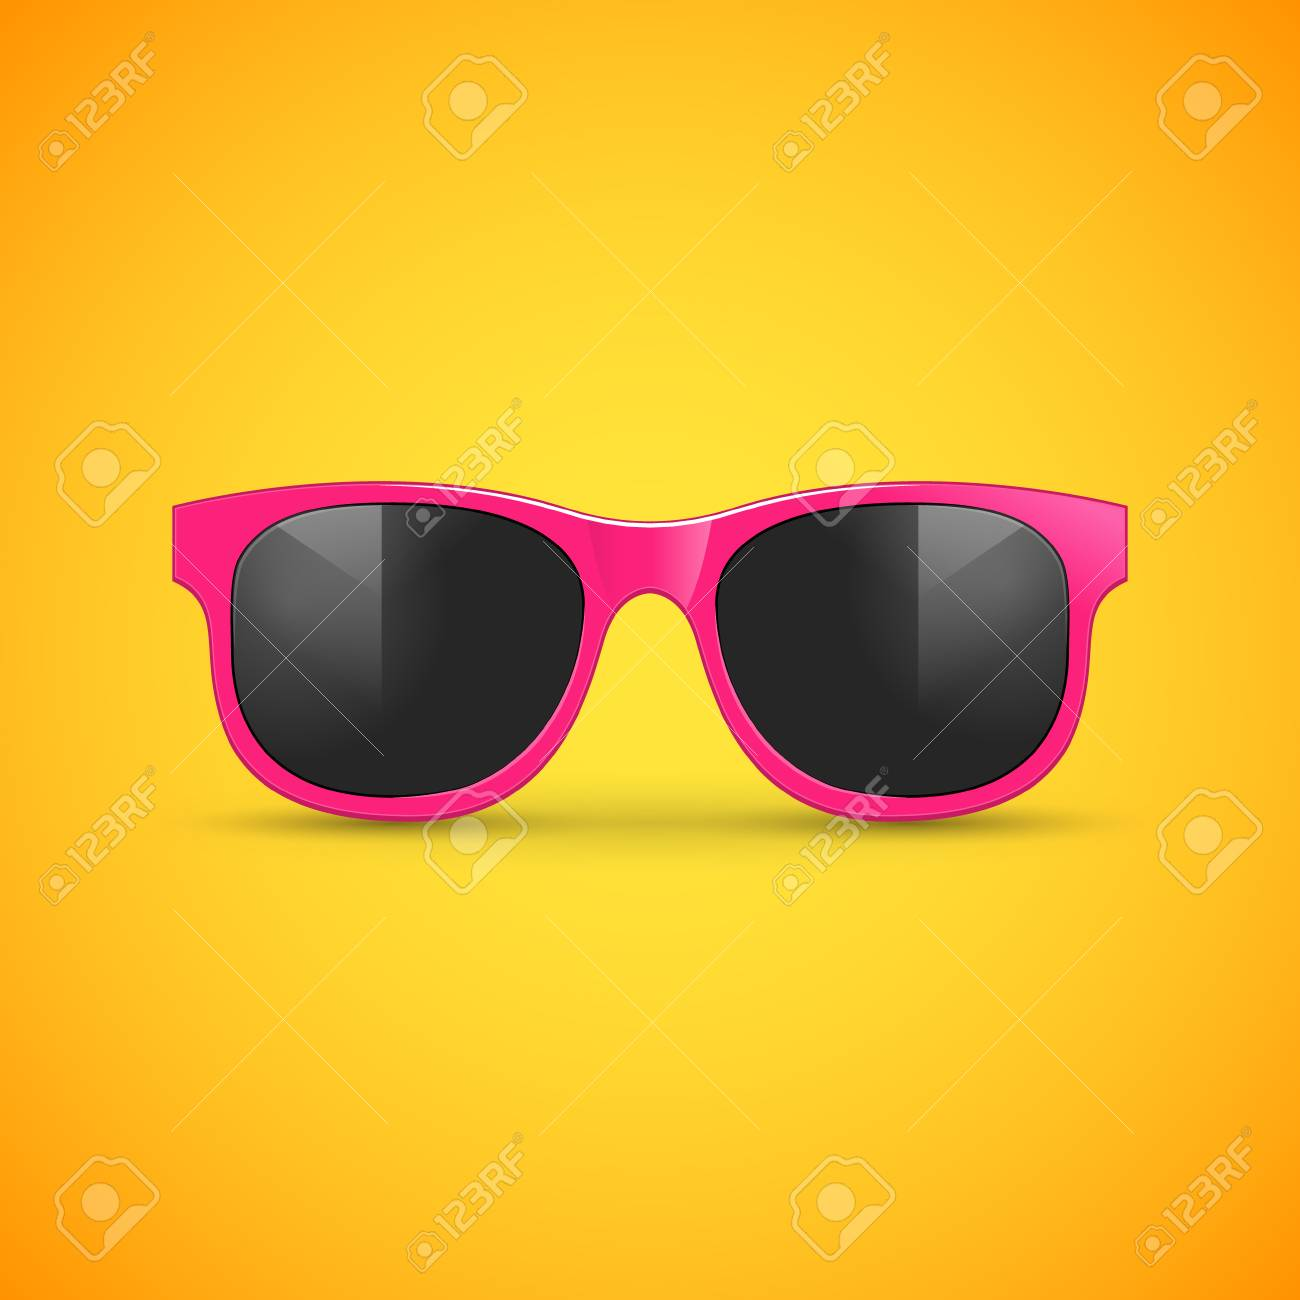 e8d602514 Vector sunglasses on yellow. Eyeglasses hipster fashion illustration..